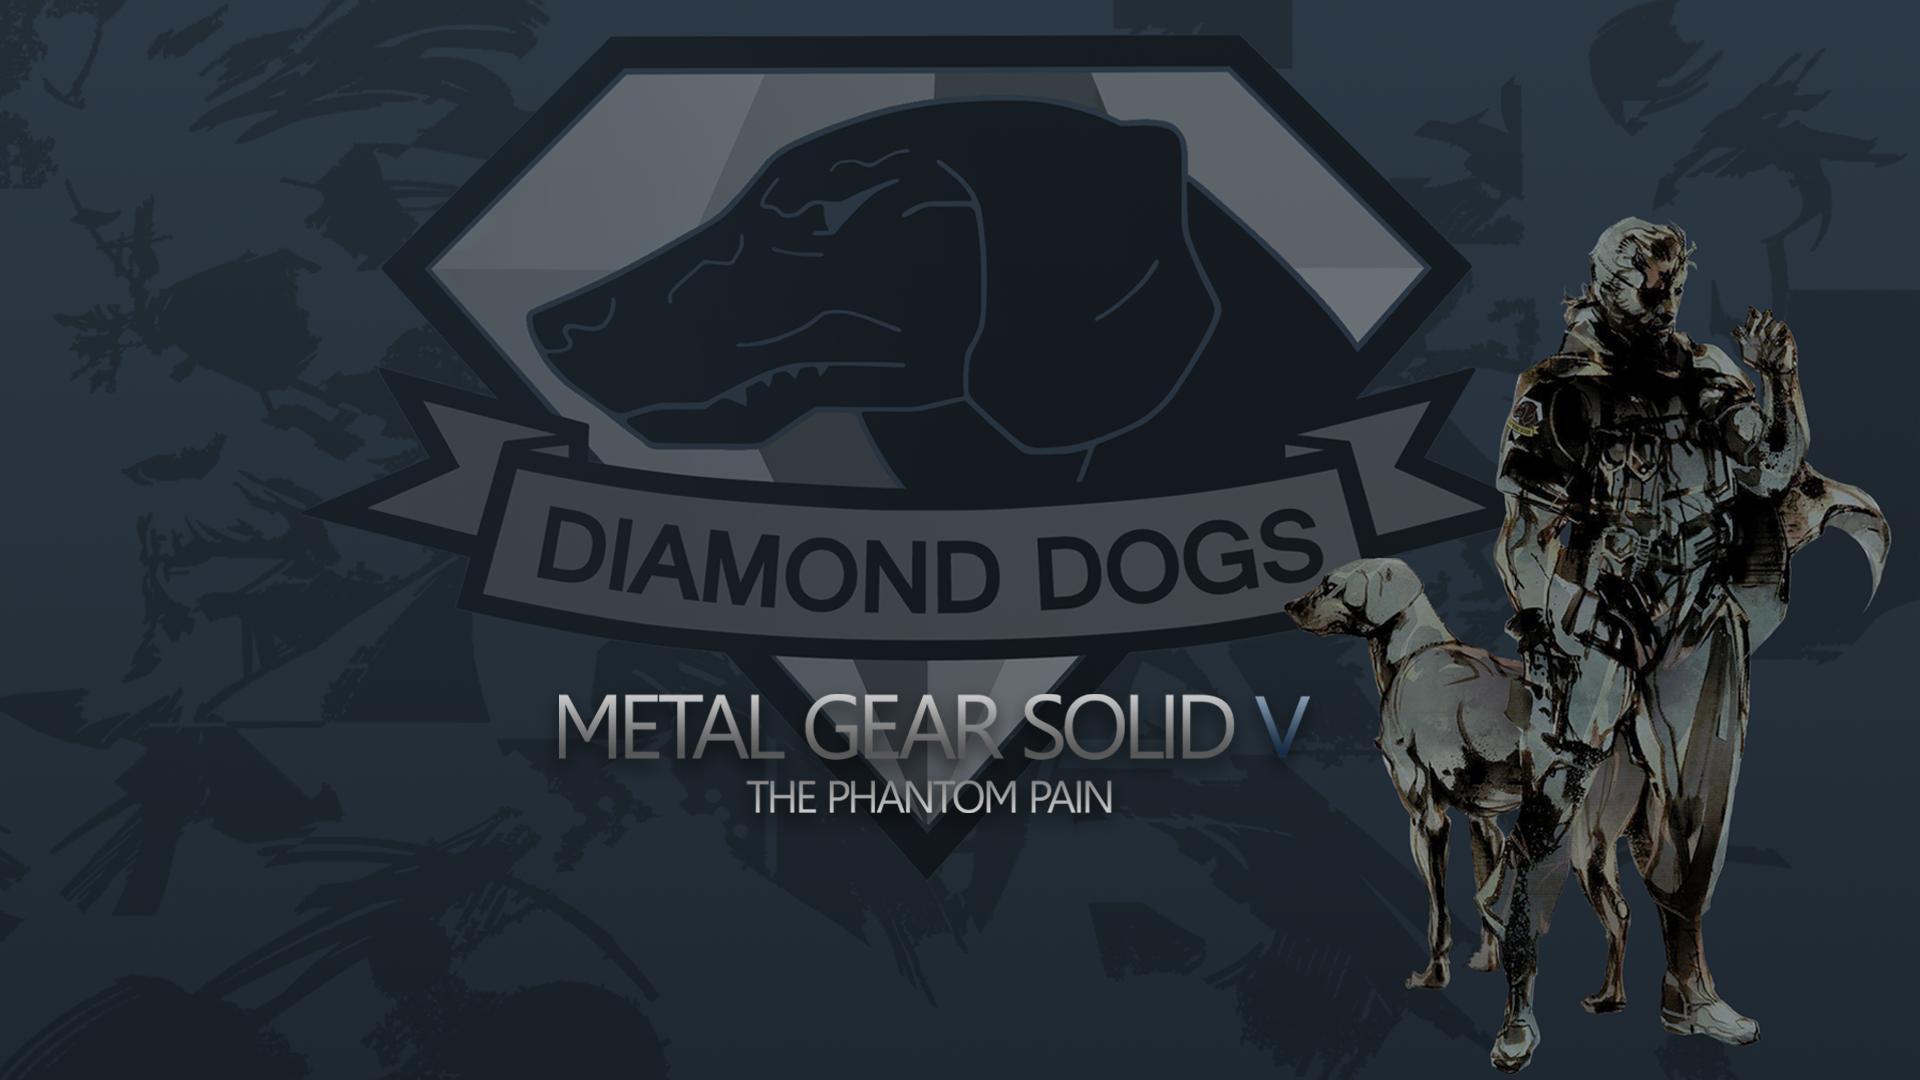 MGSV Diamond Dogs   Wallpaper by SleepingSandman 1920x1080